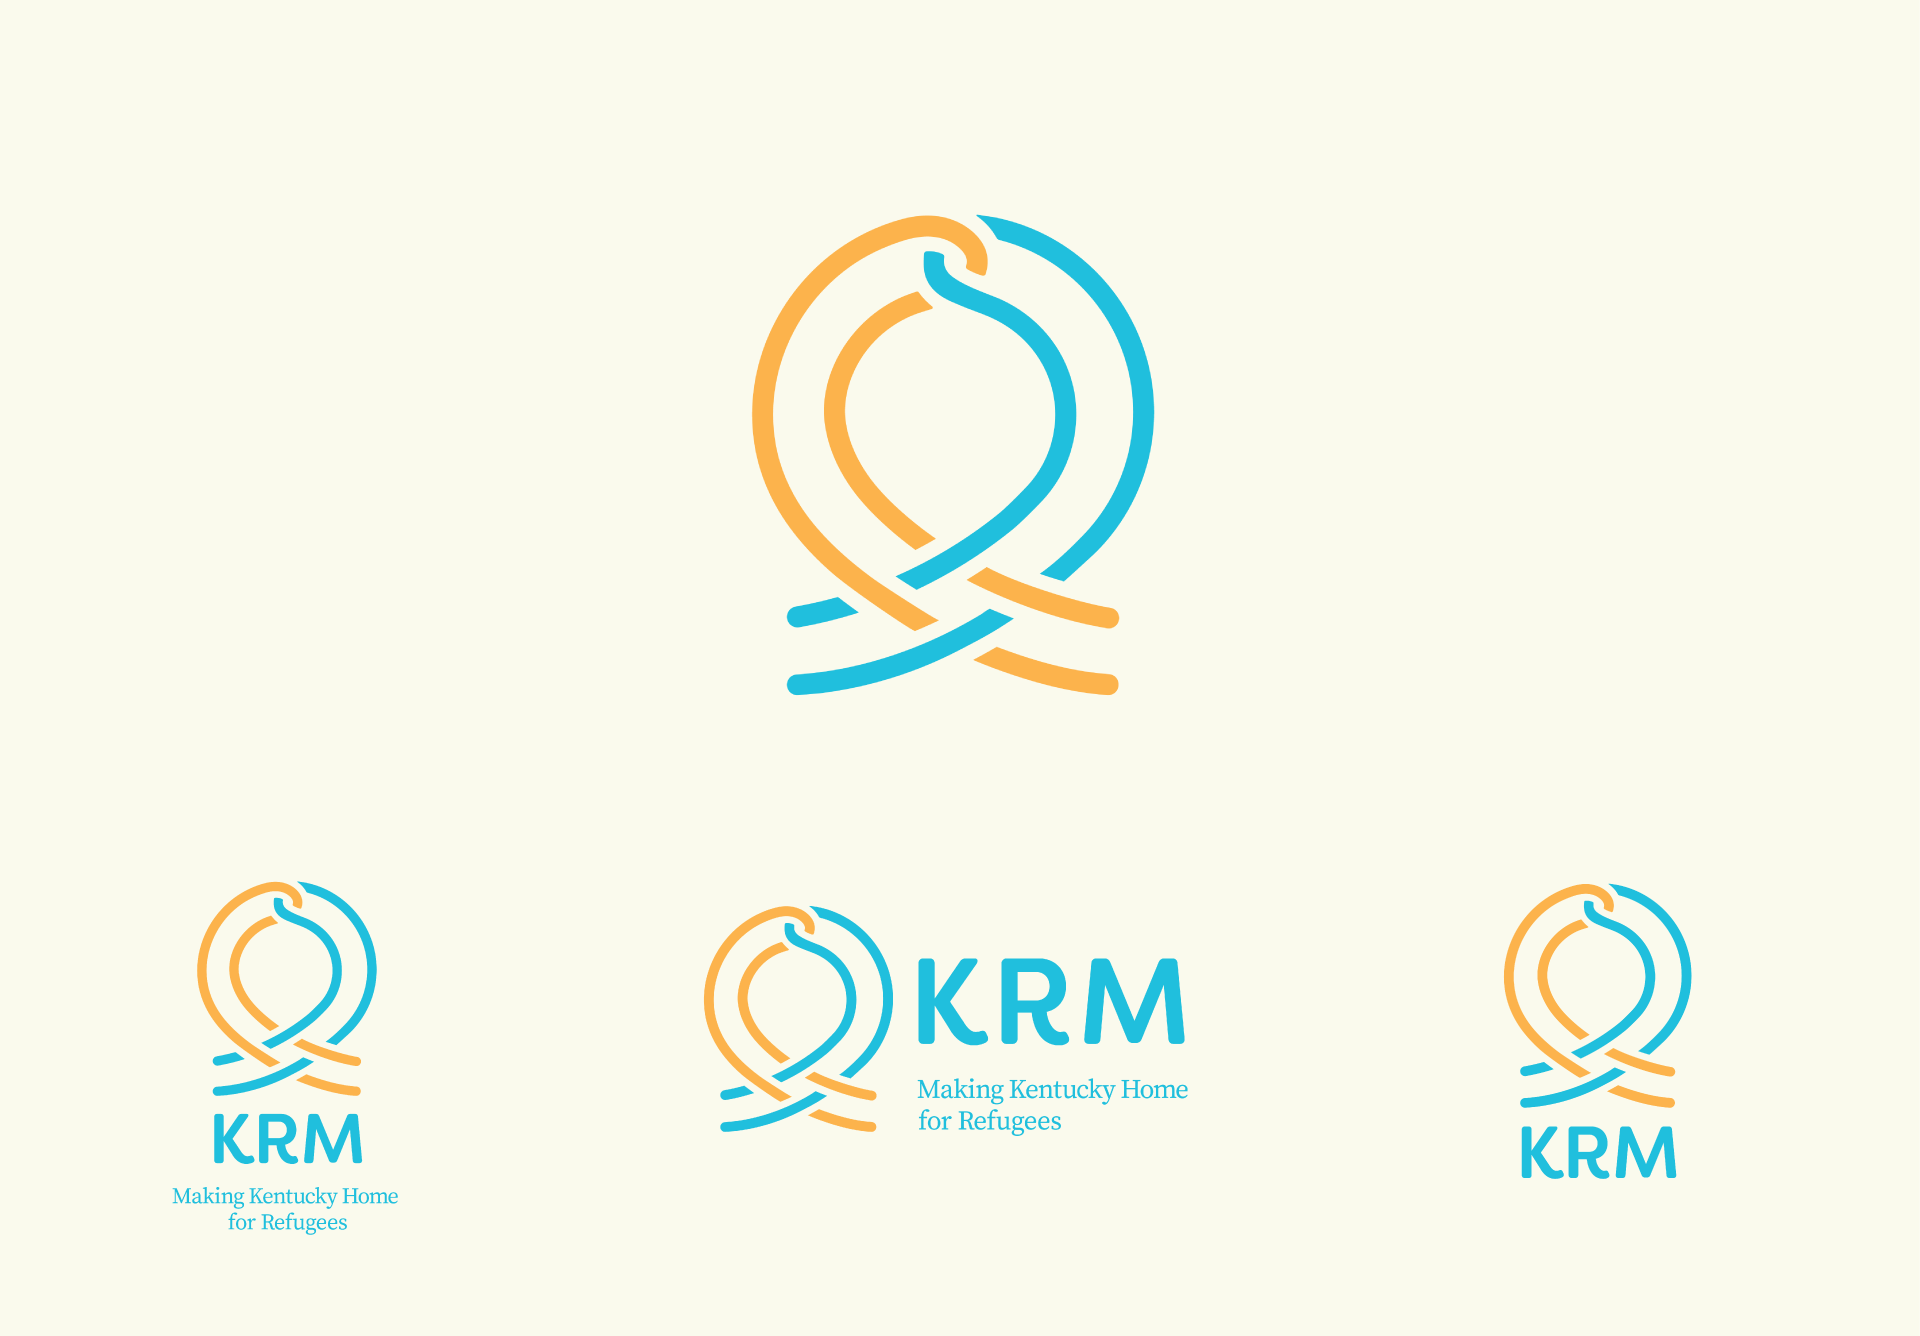 krm-logo-fam-cream.png